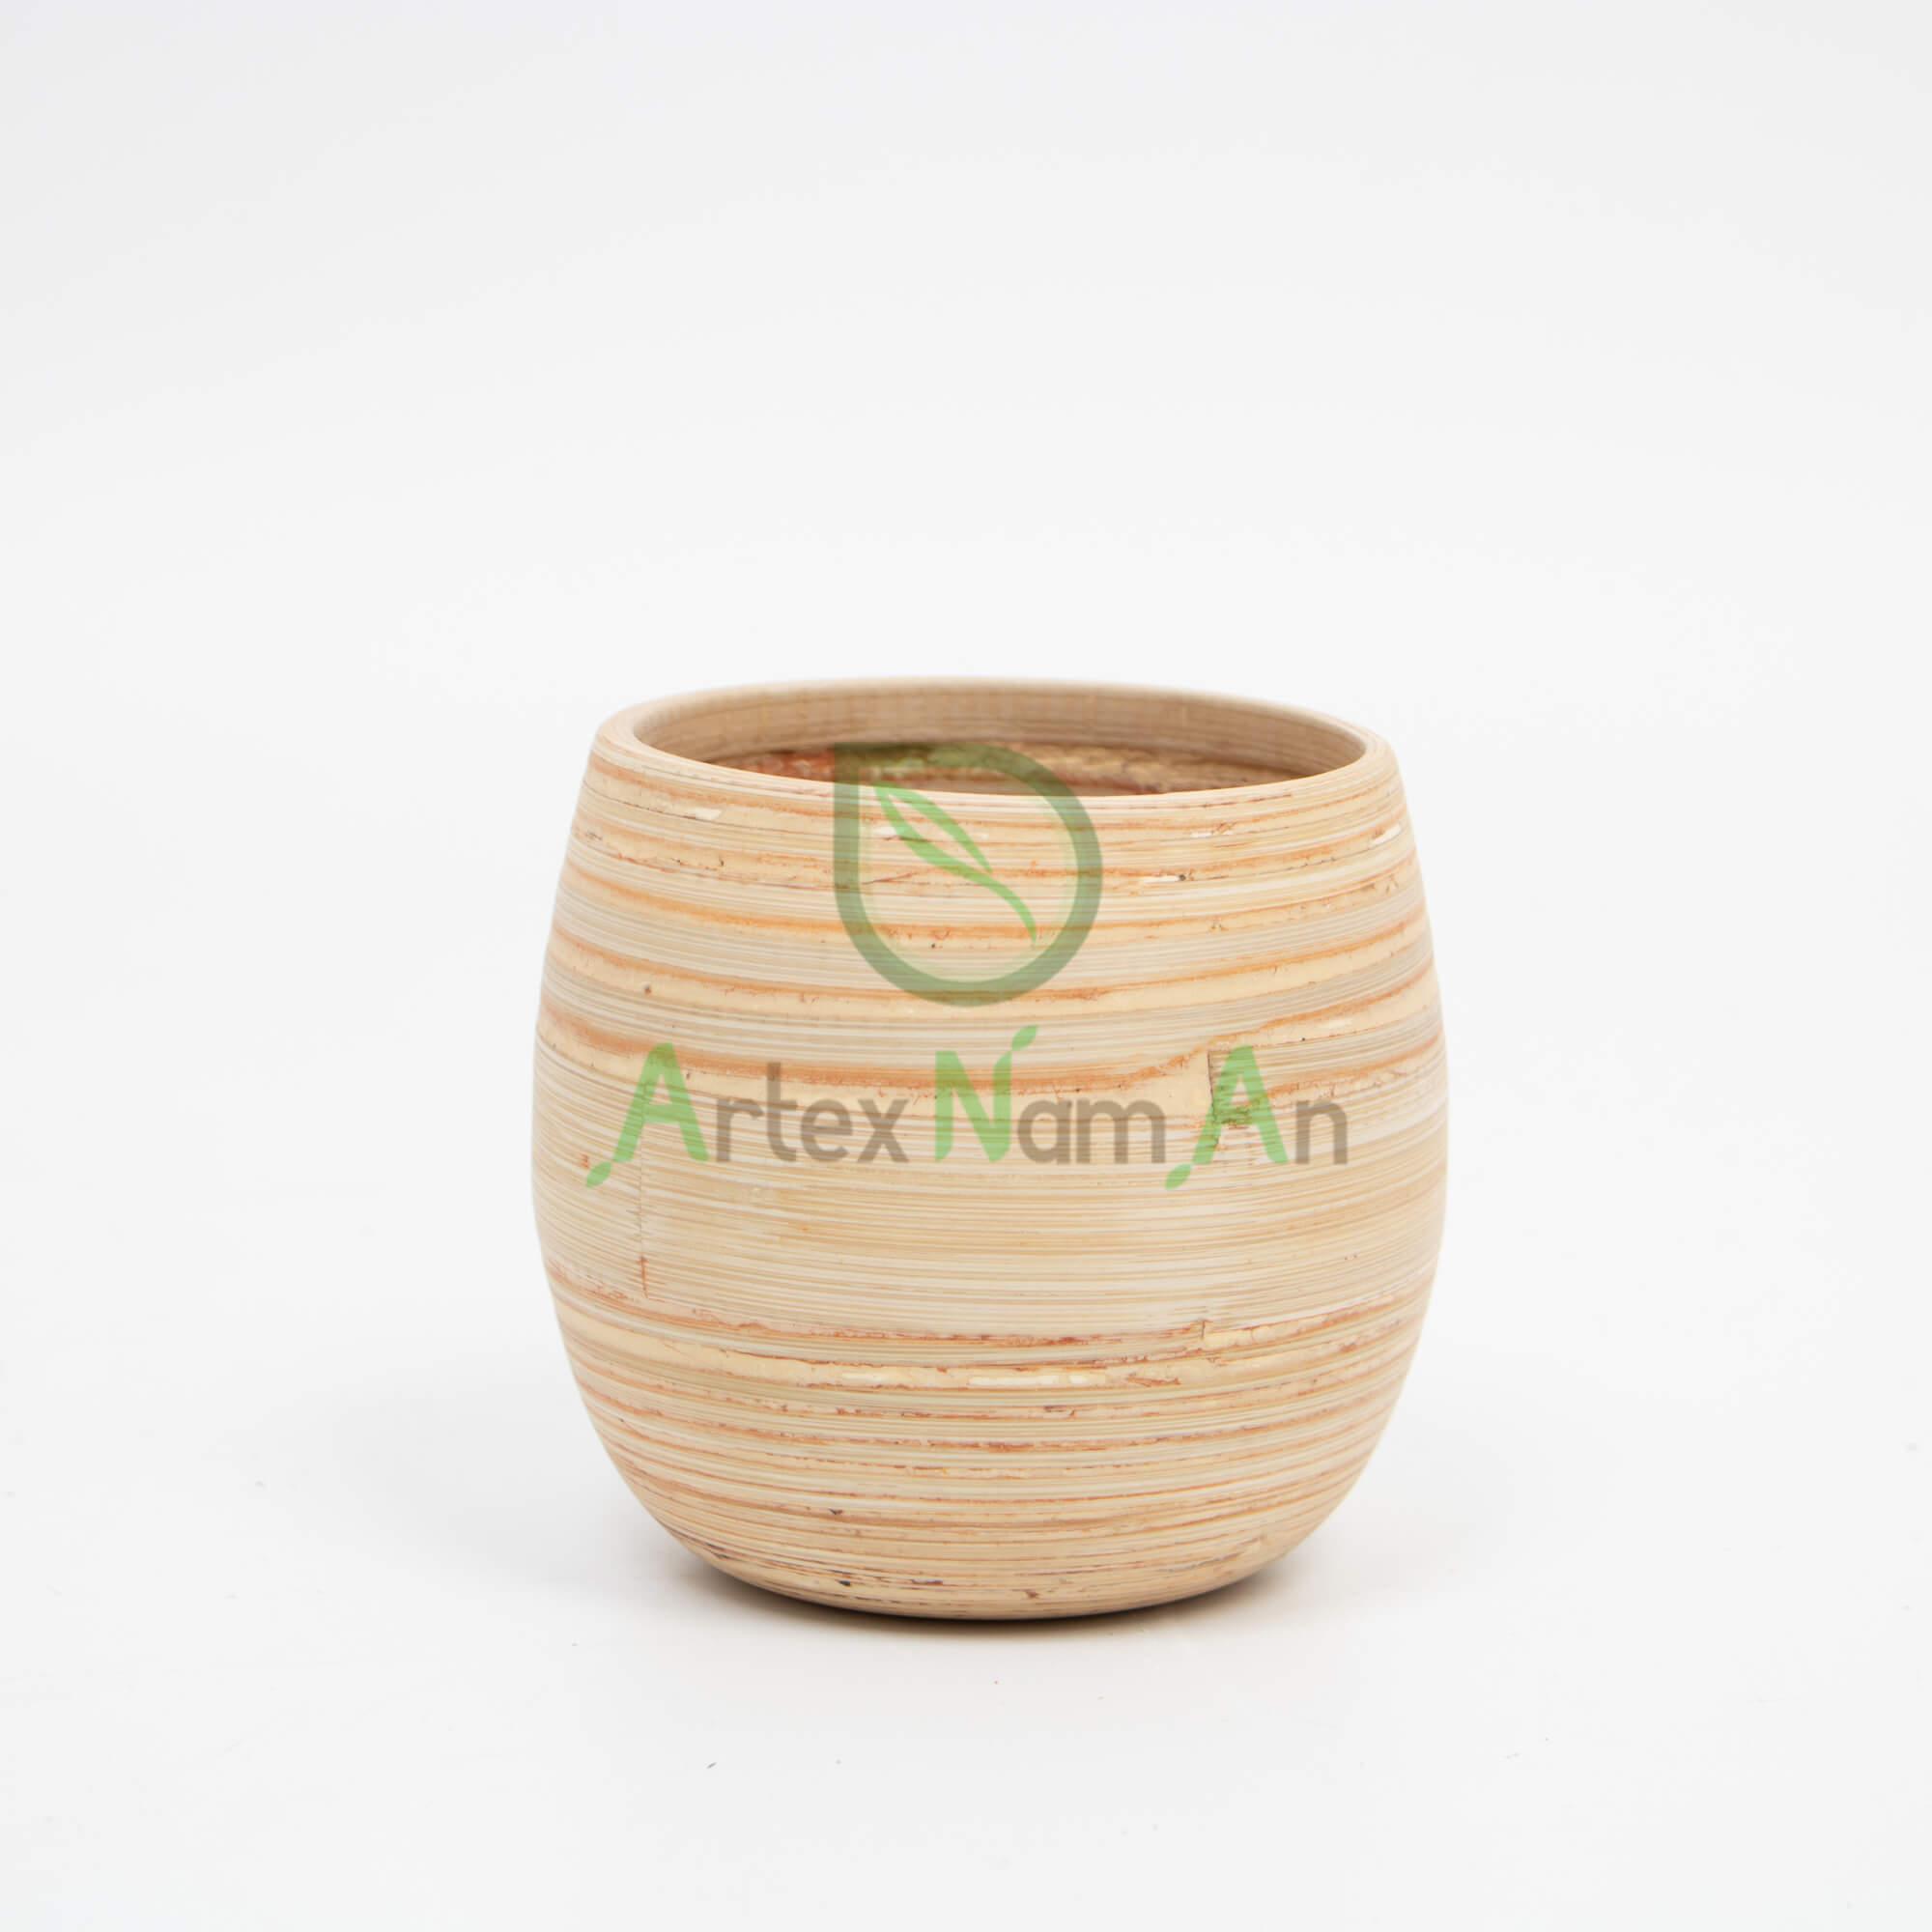 Handmade, Round Indoor planters made of Bamboo